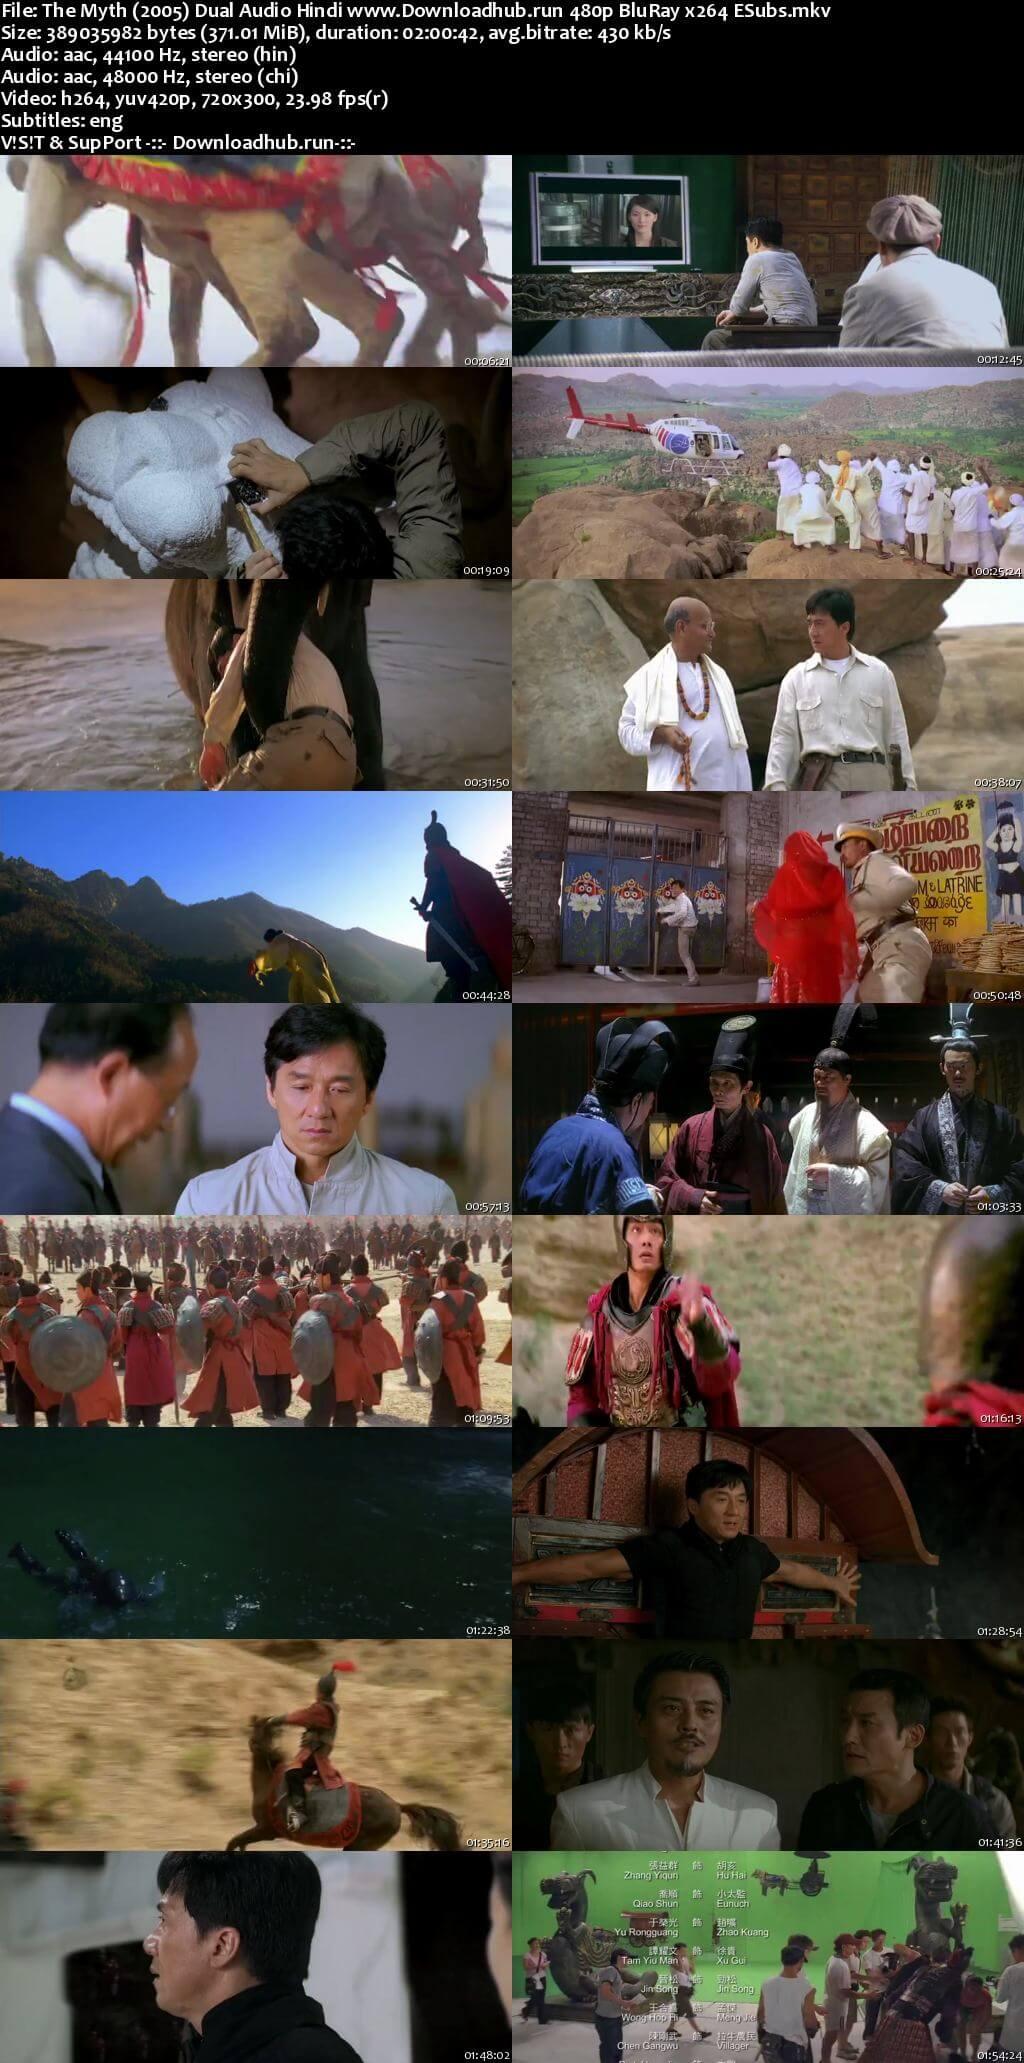 The Myth 2005 Hindi Dual Audio 350MB BluRay 480p ESubs